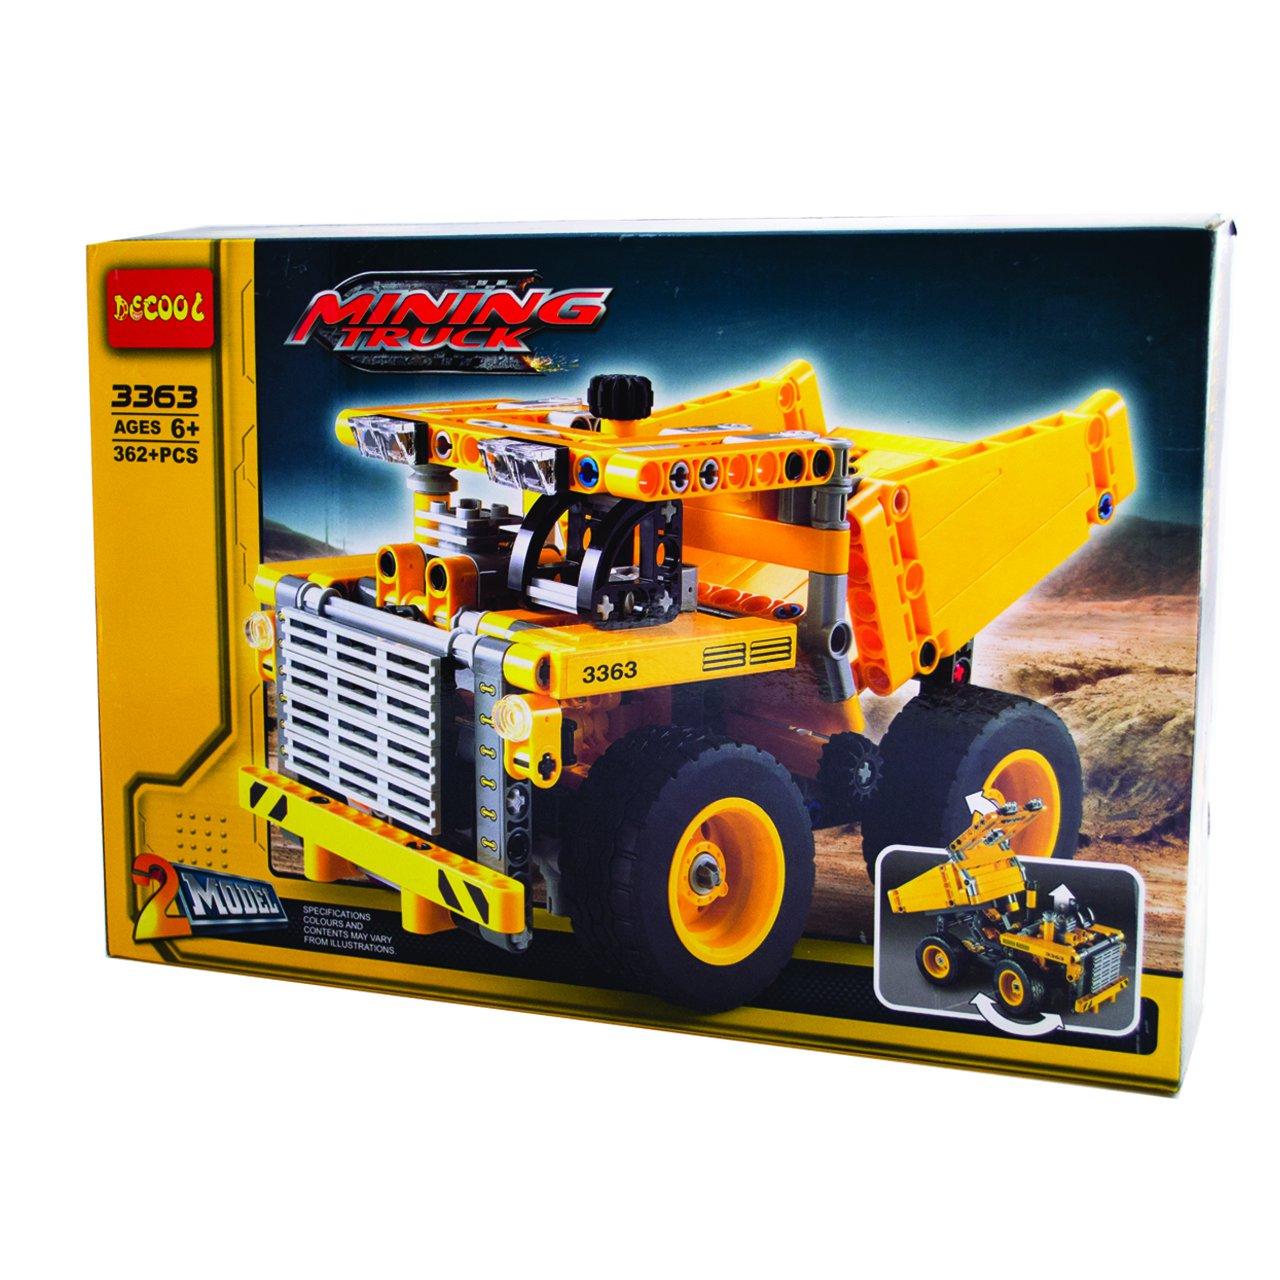 ساختنی دکول طرح ماشین راه سازی مدل mining truck کد 3363